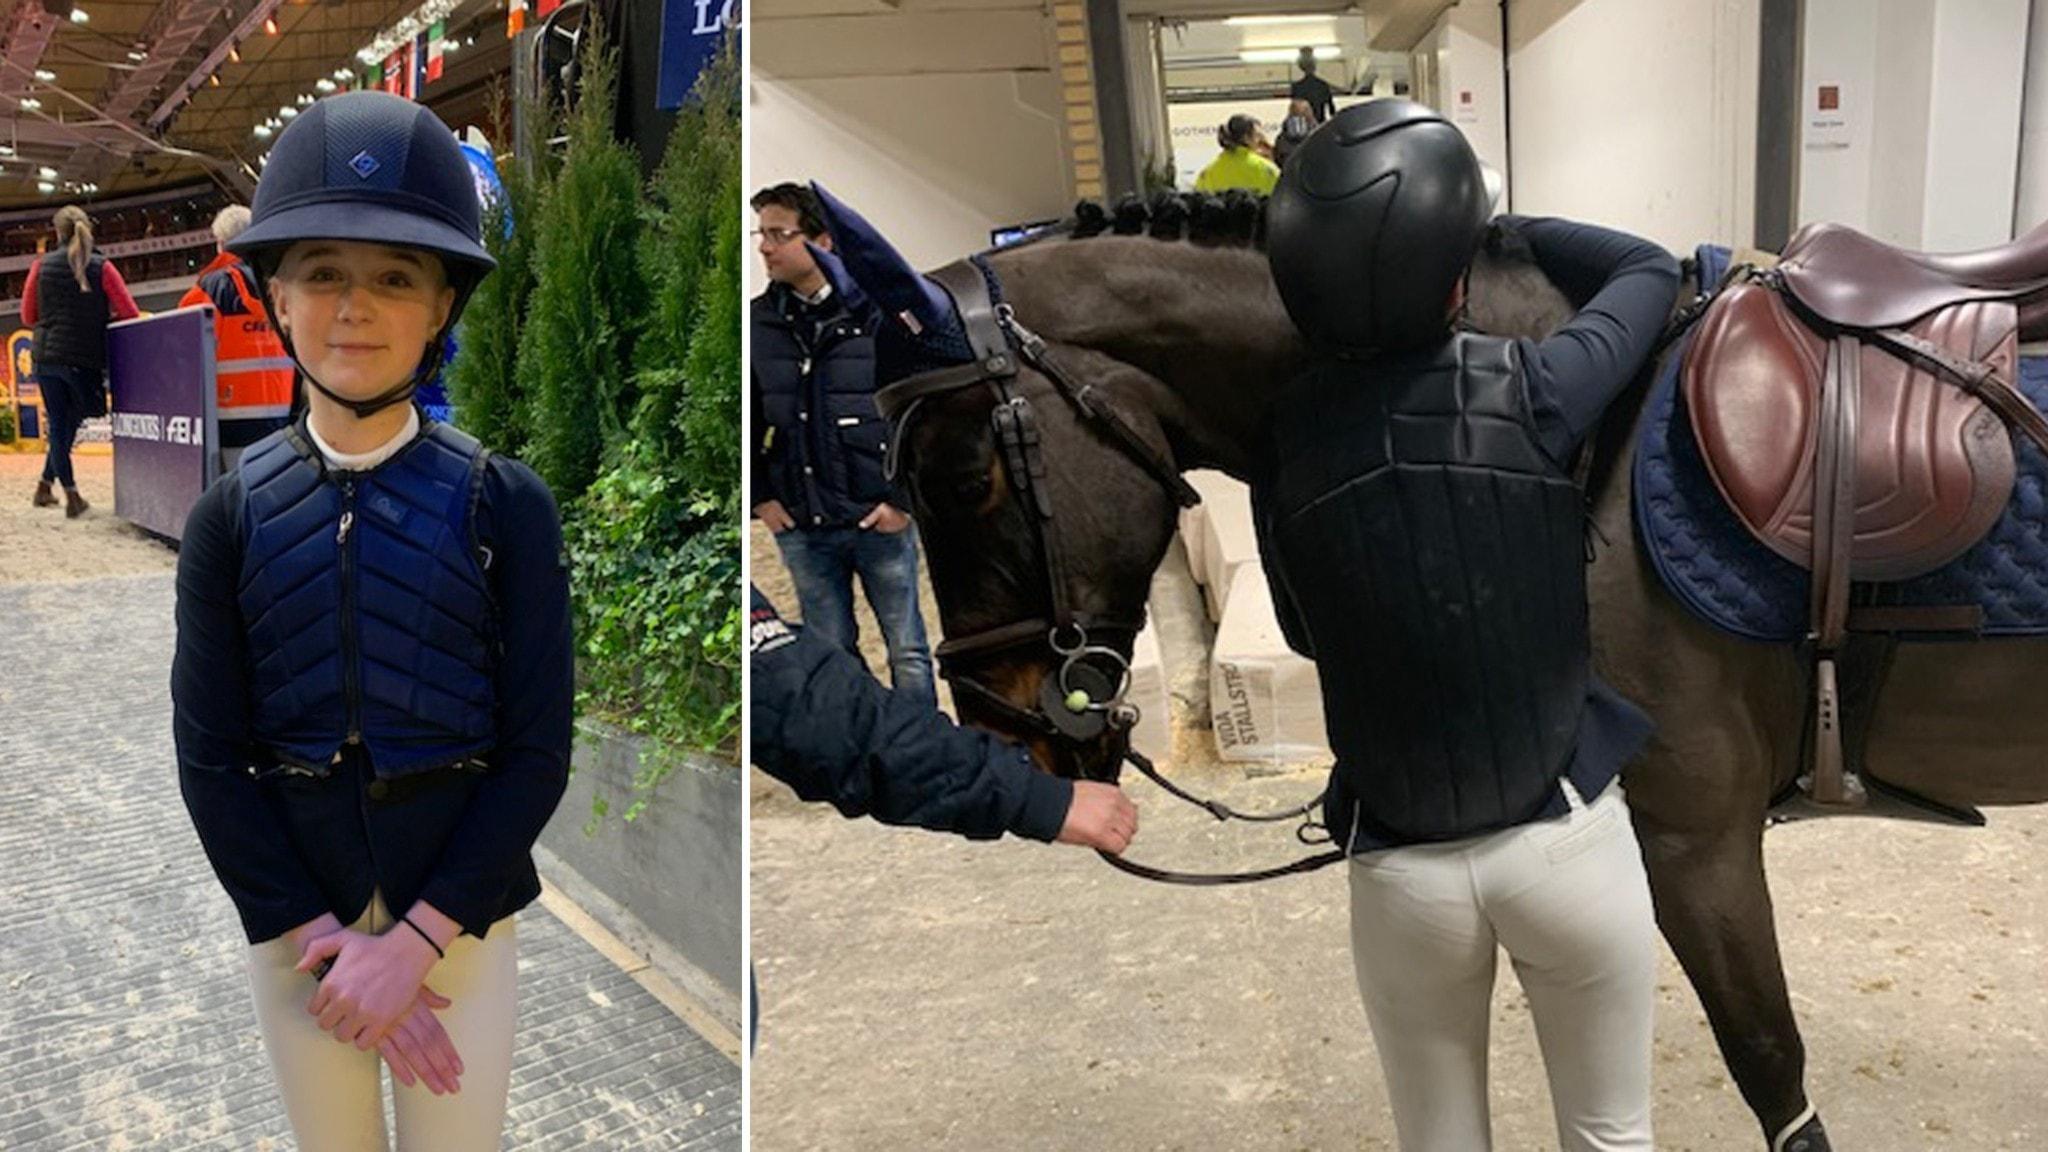 Unga ponnyryttarna tävlade inför storpublik